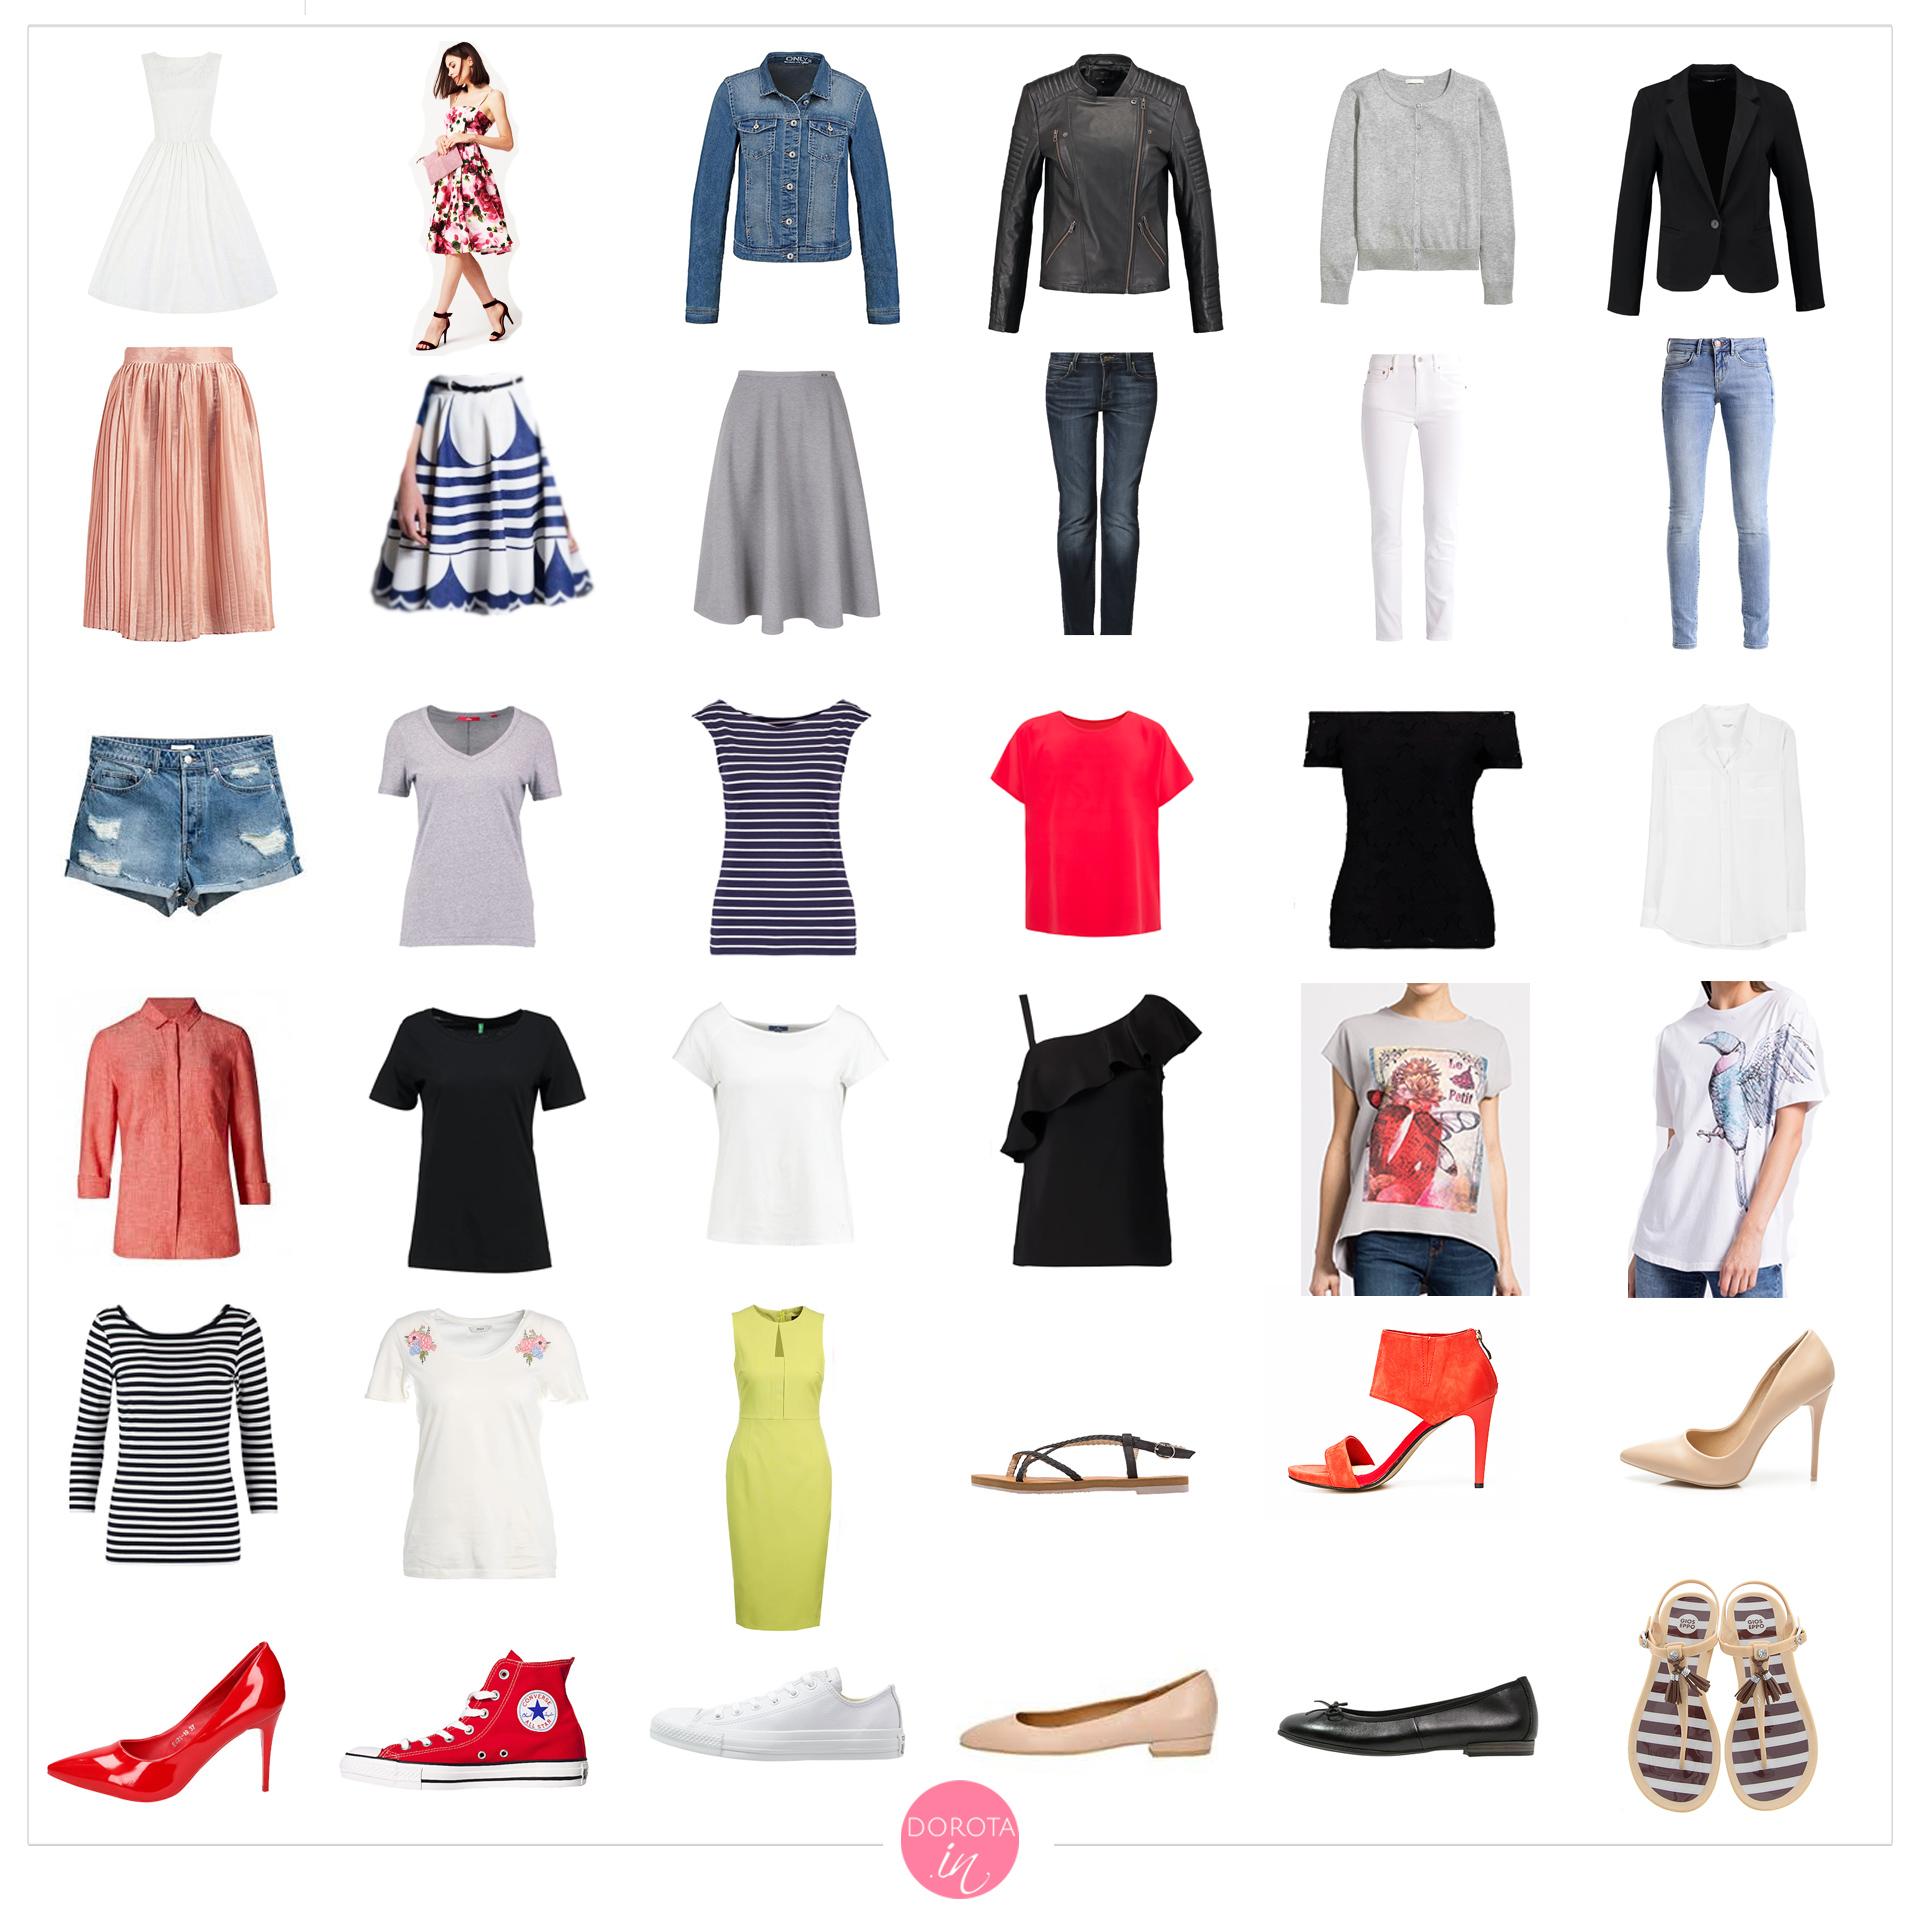 Garderoba kapsułowa na lato - letnia szafa minimalna